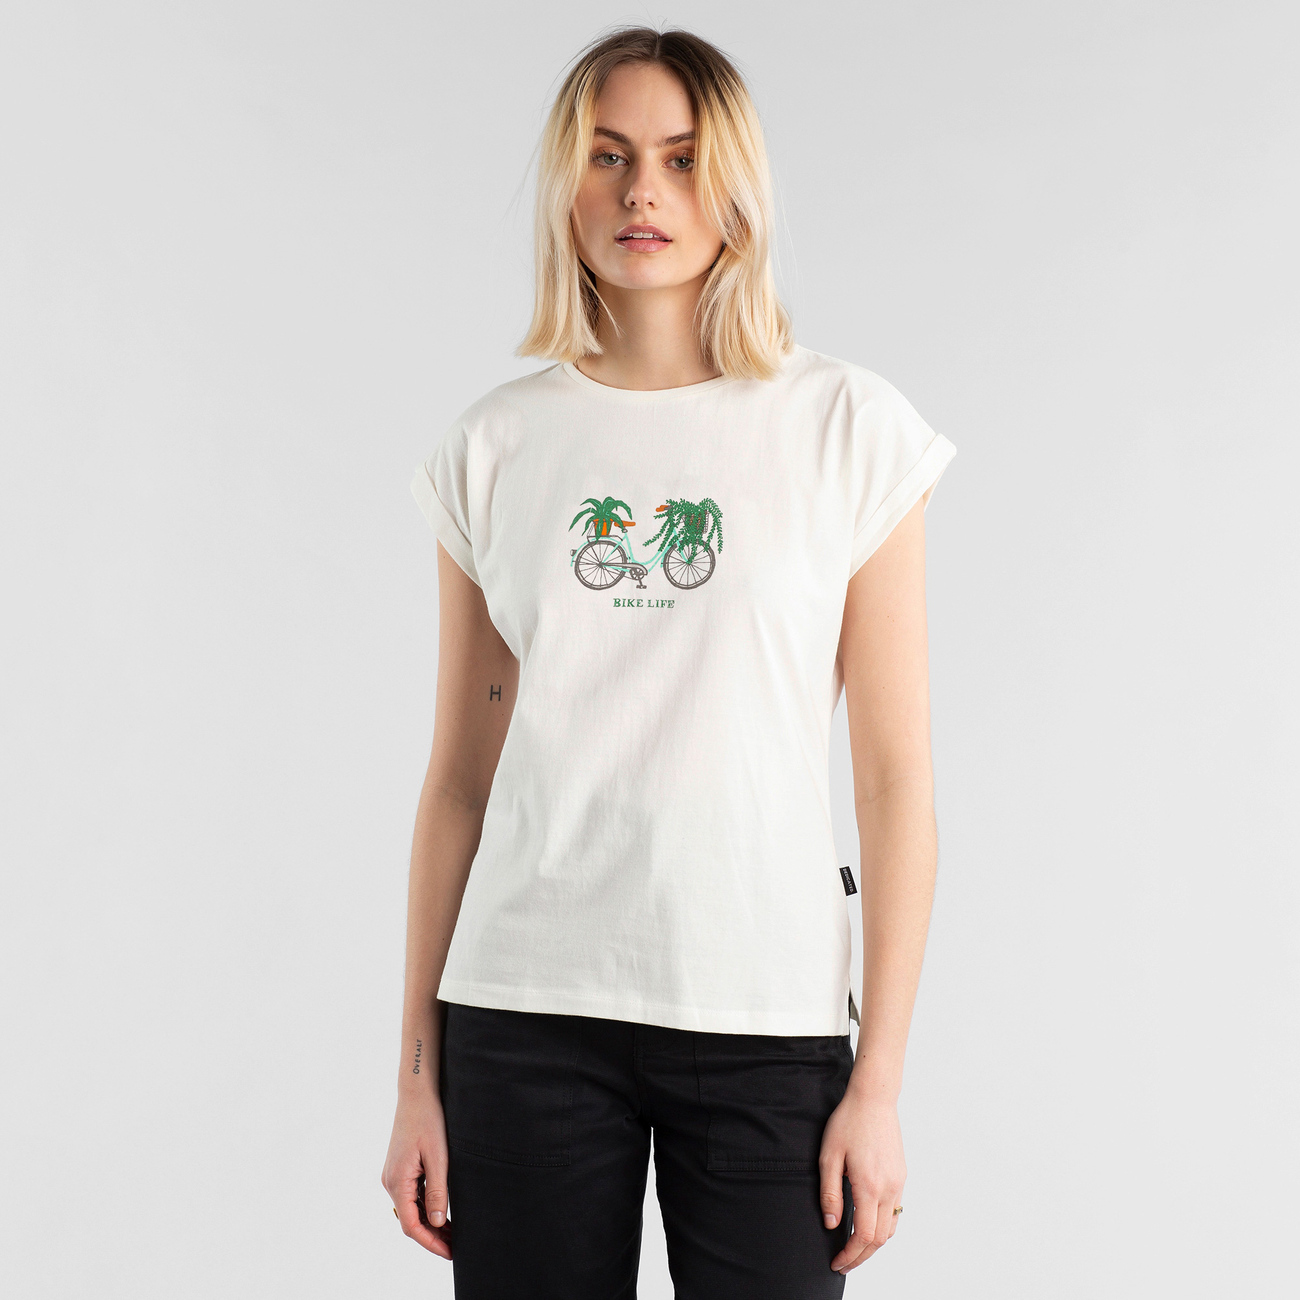 T-shirt Visby Bike Life Off-White